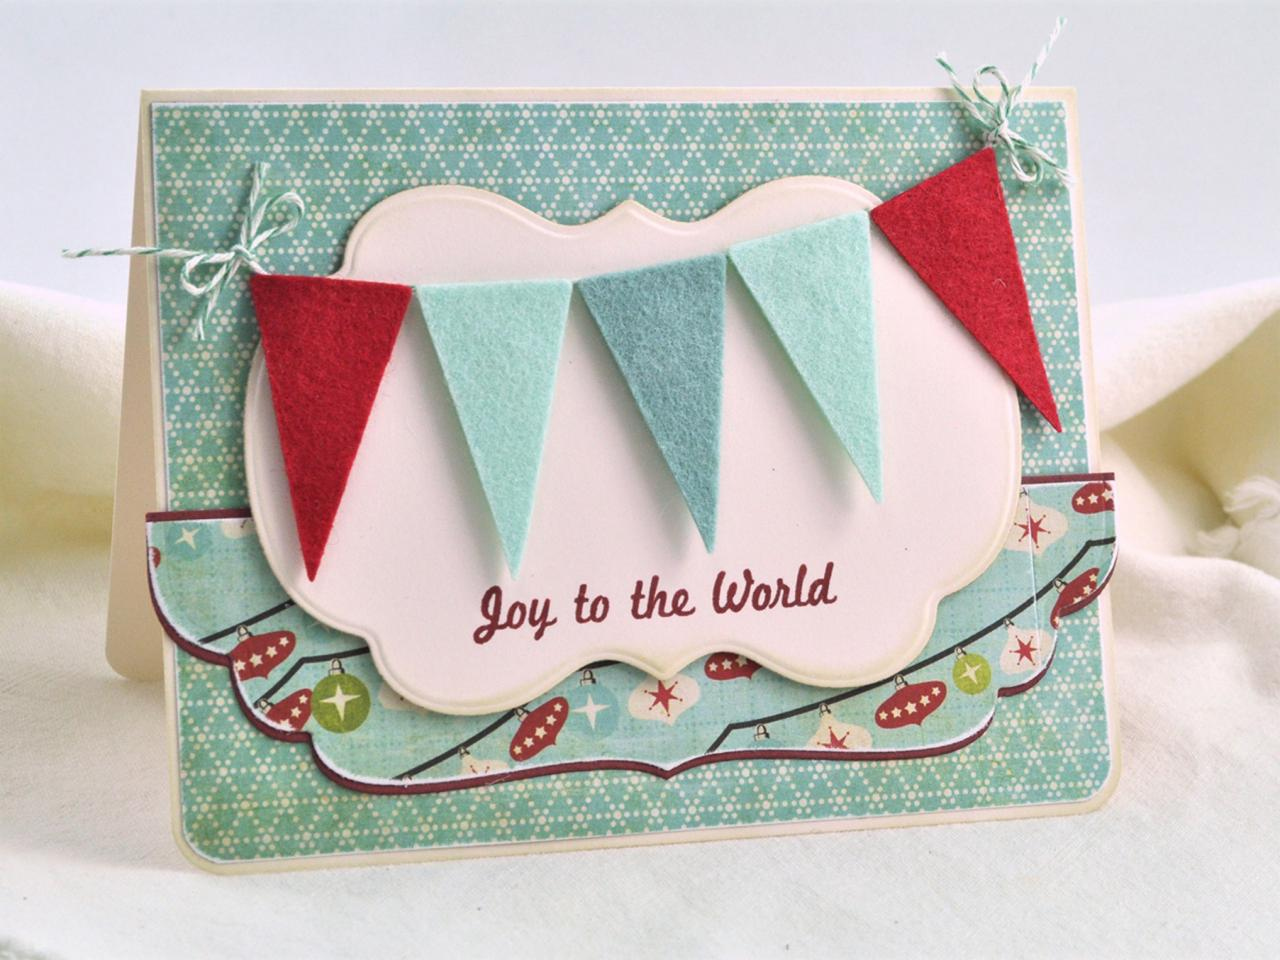 Handmade holiday card with colorful felt pennants hgtv - Interaktive weihnachtskarte ...